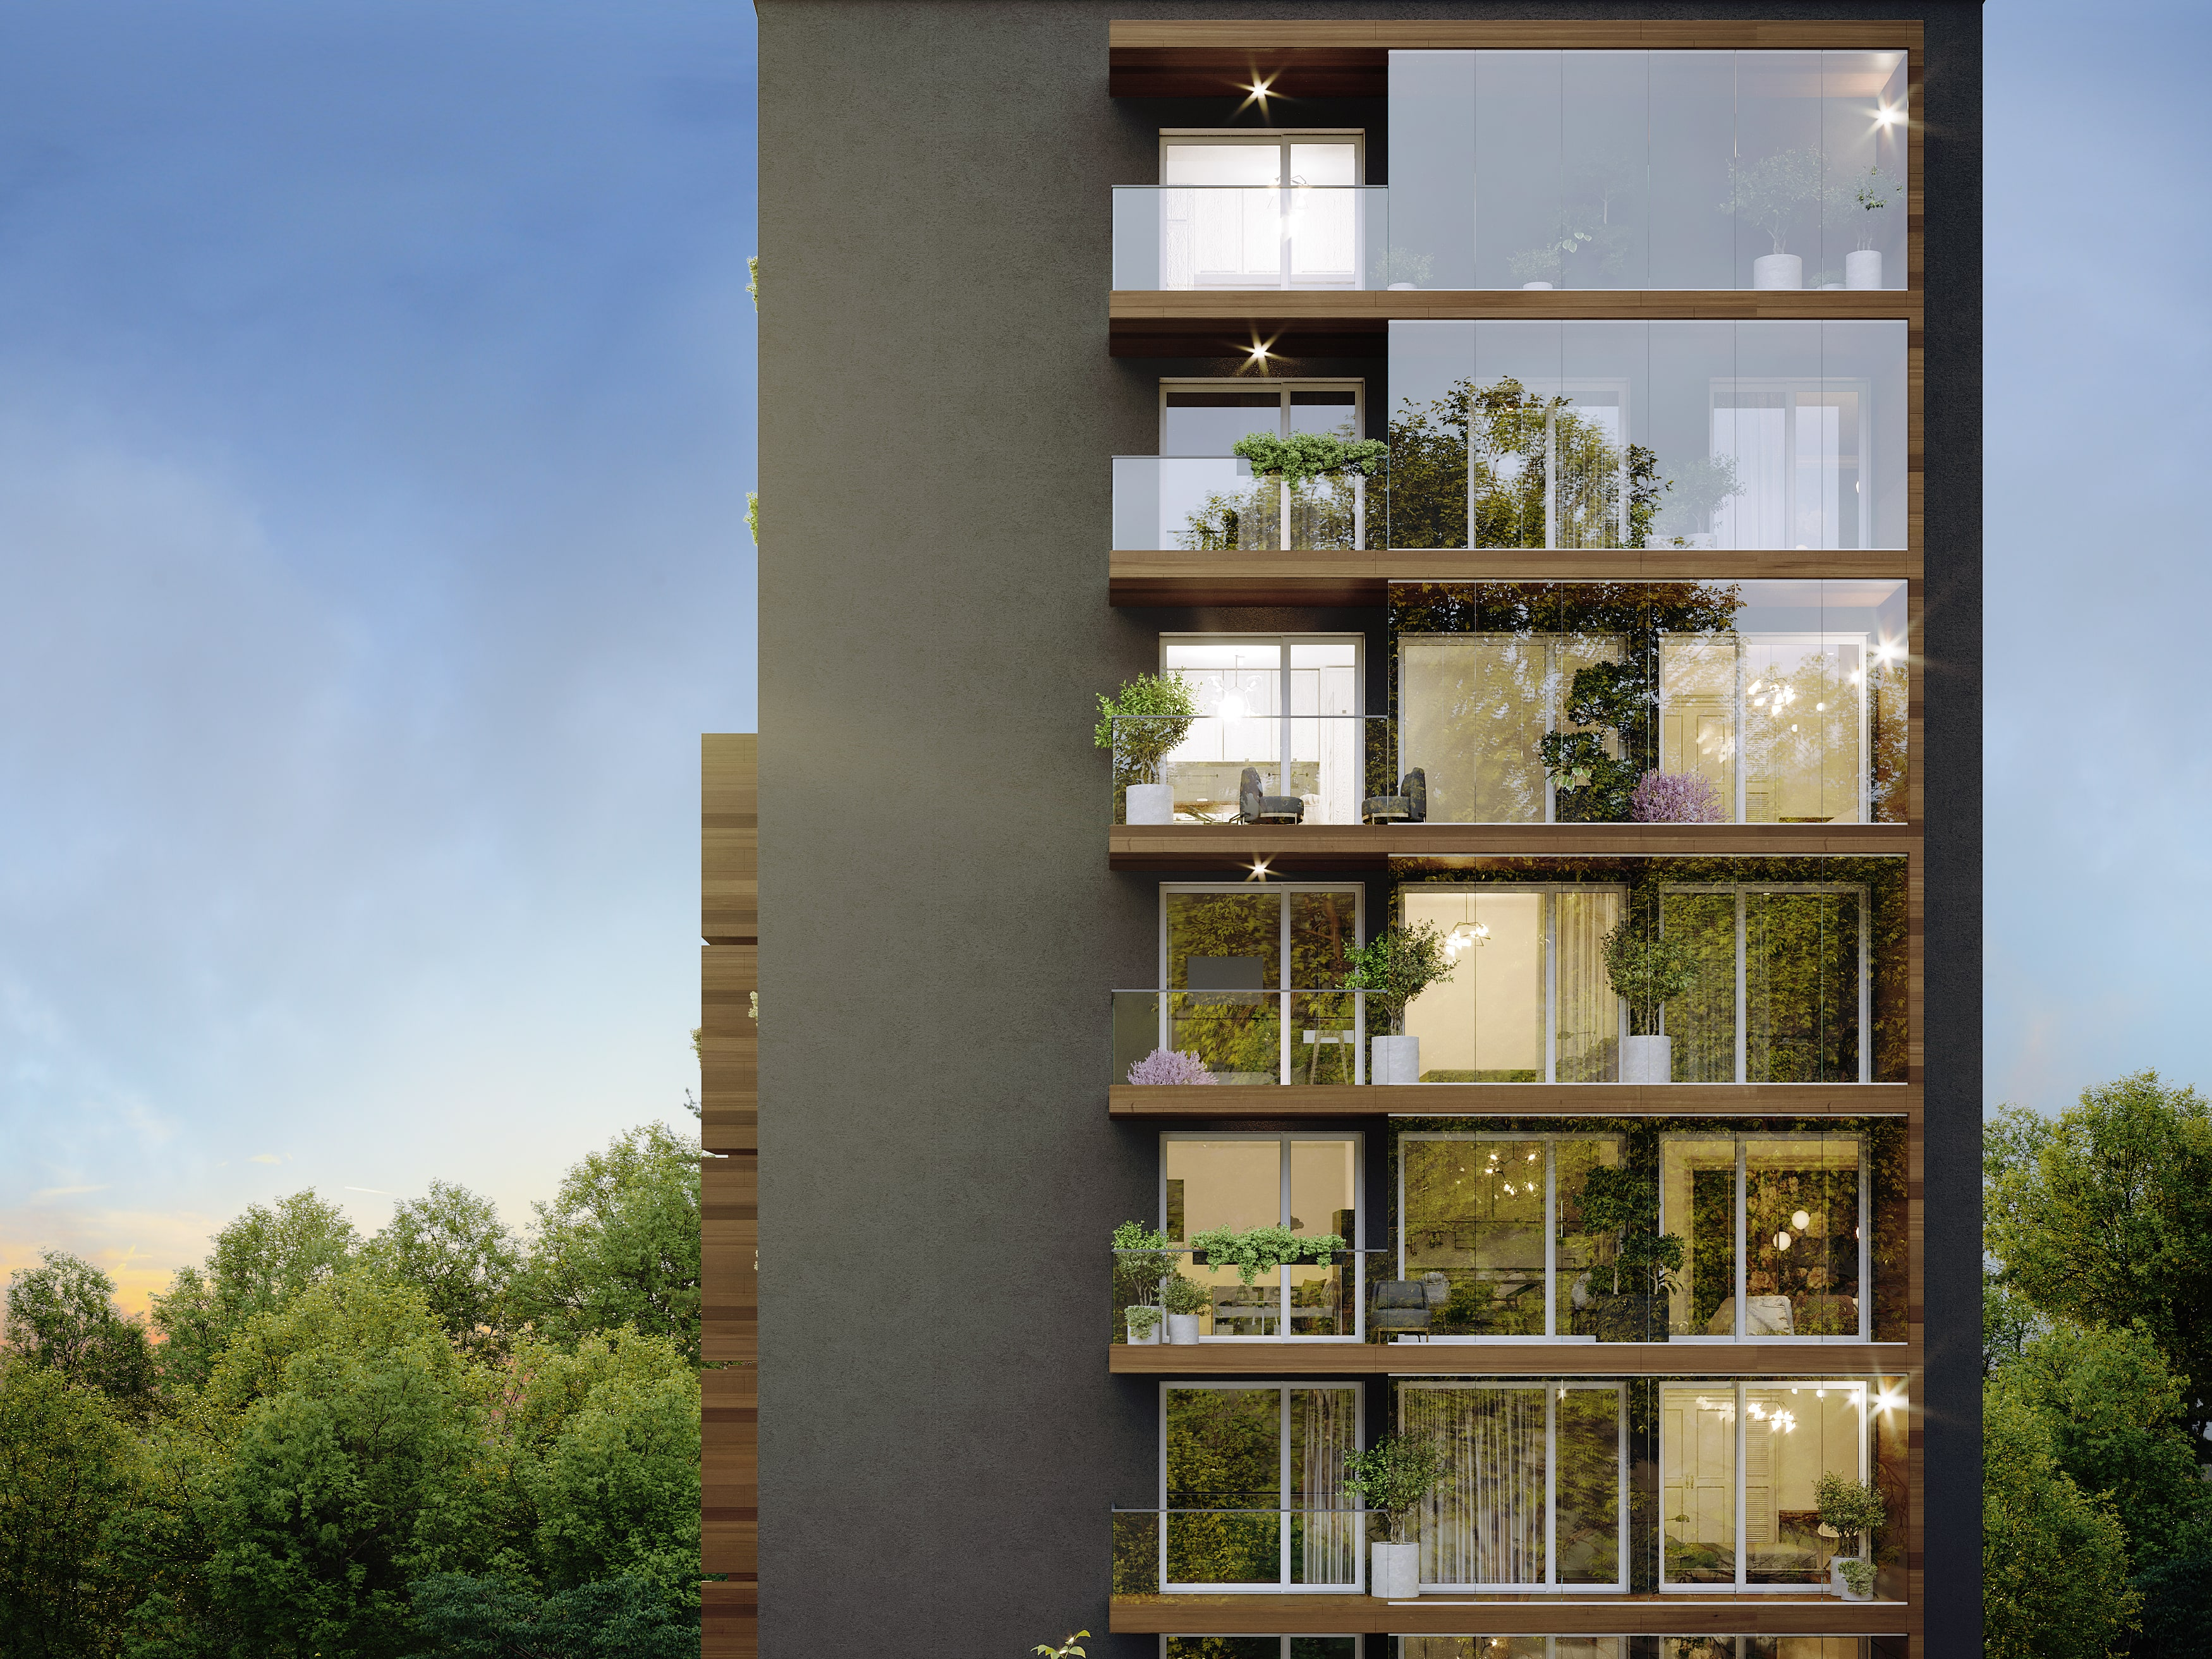 Modern apartments with French windows. Residential project View Spořilov Prague 4 - Záběhlice. Developer GARTAL